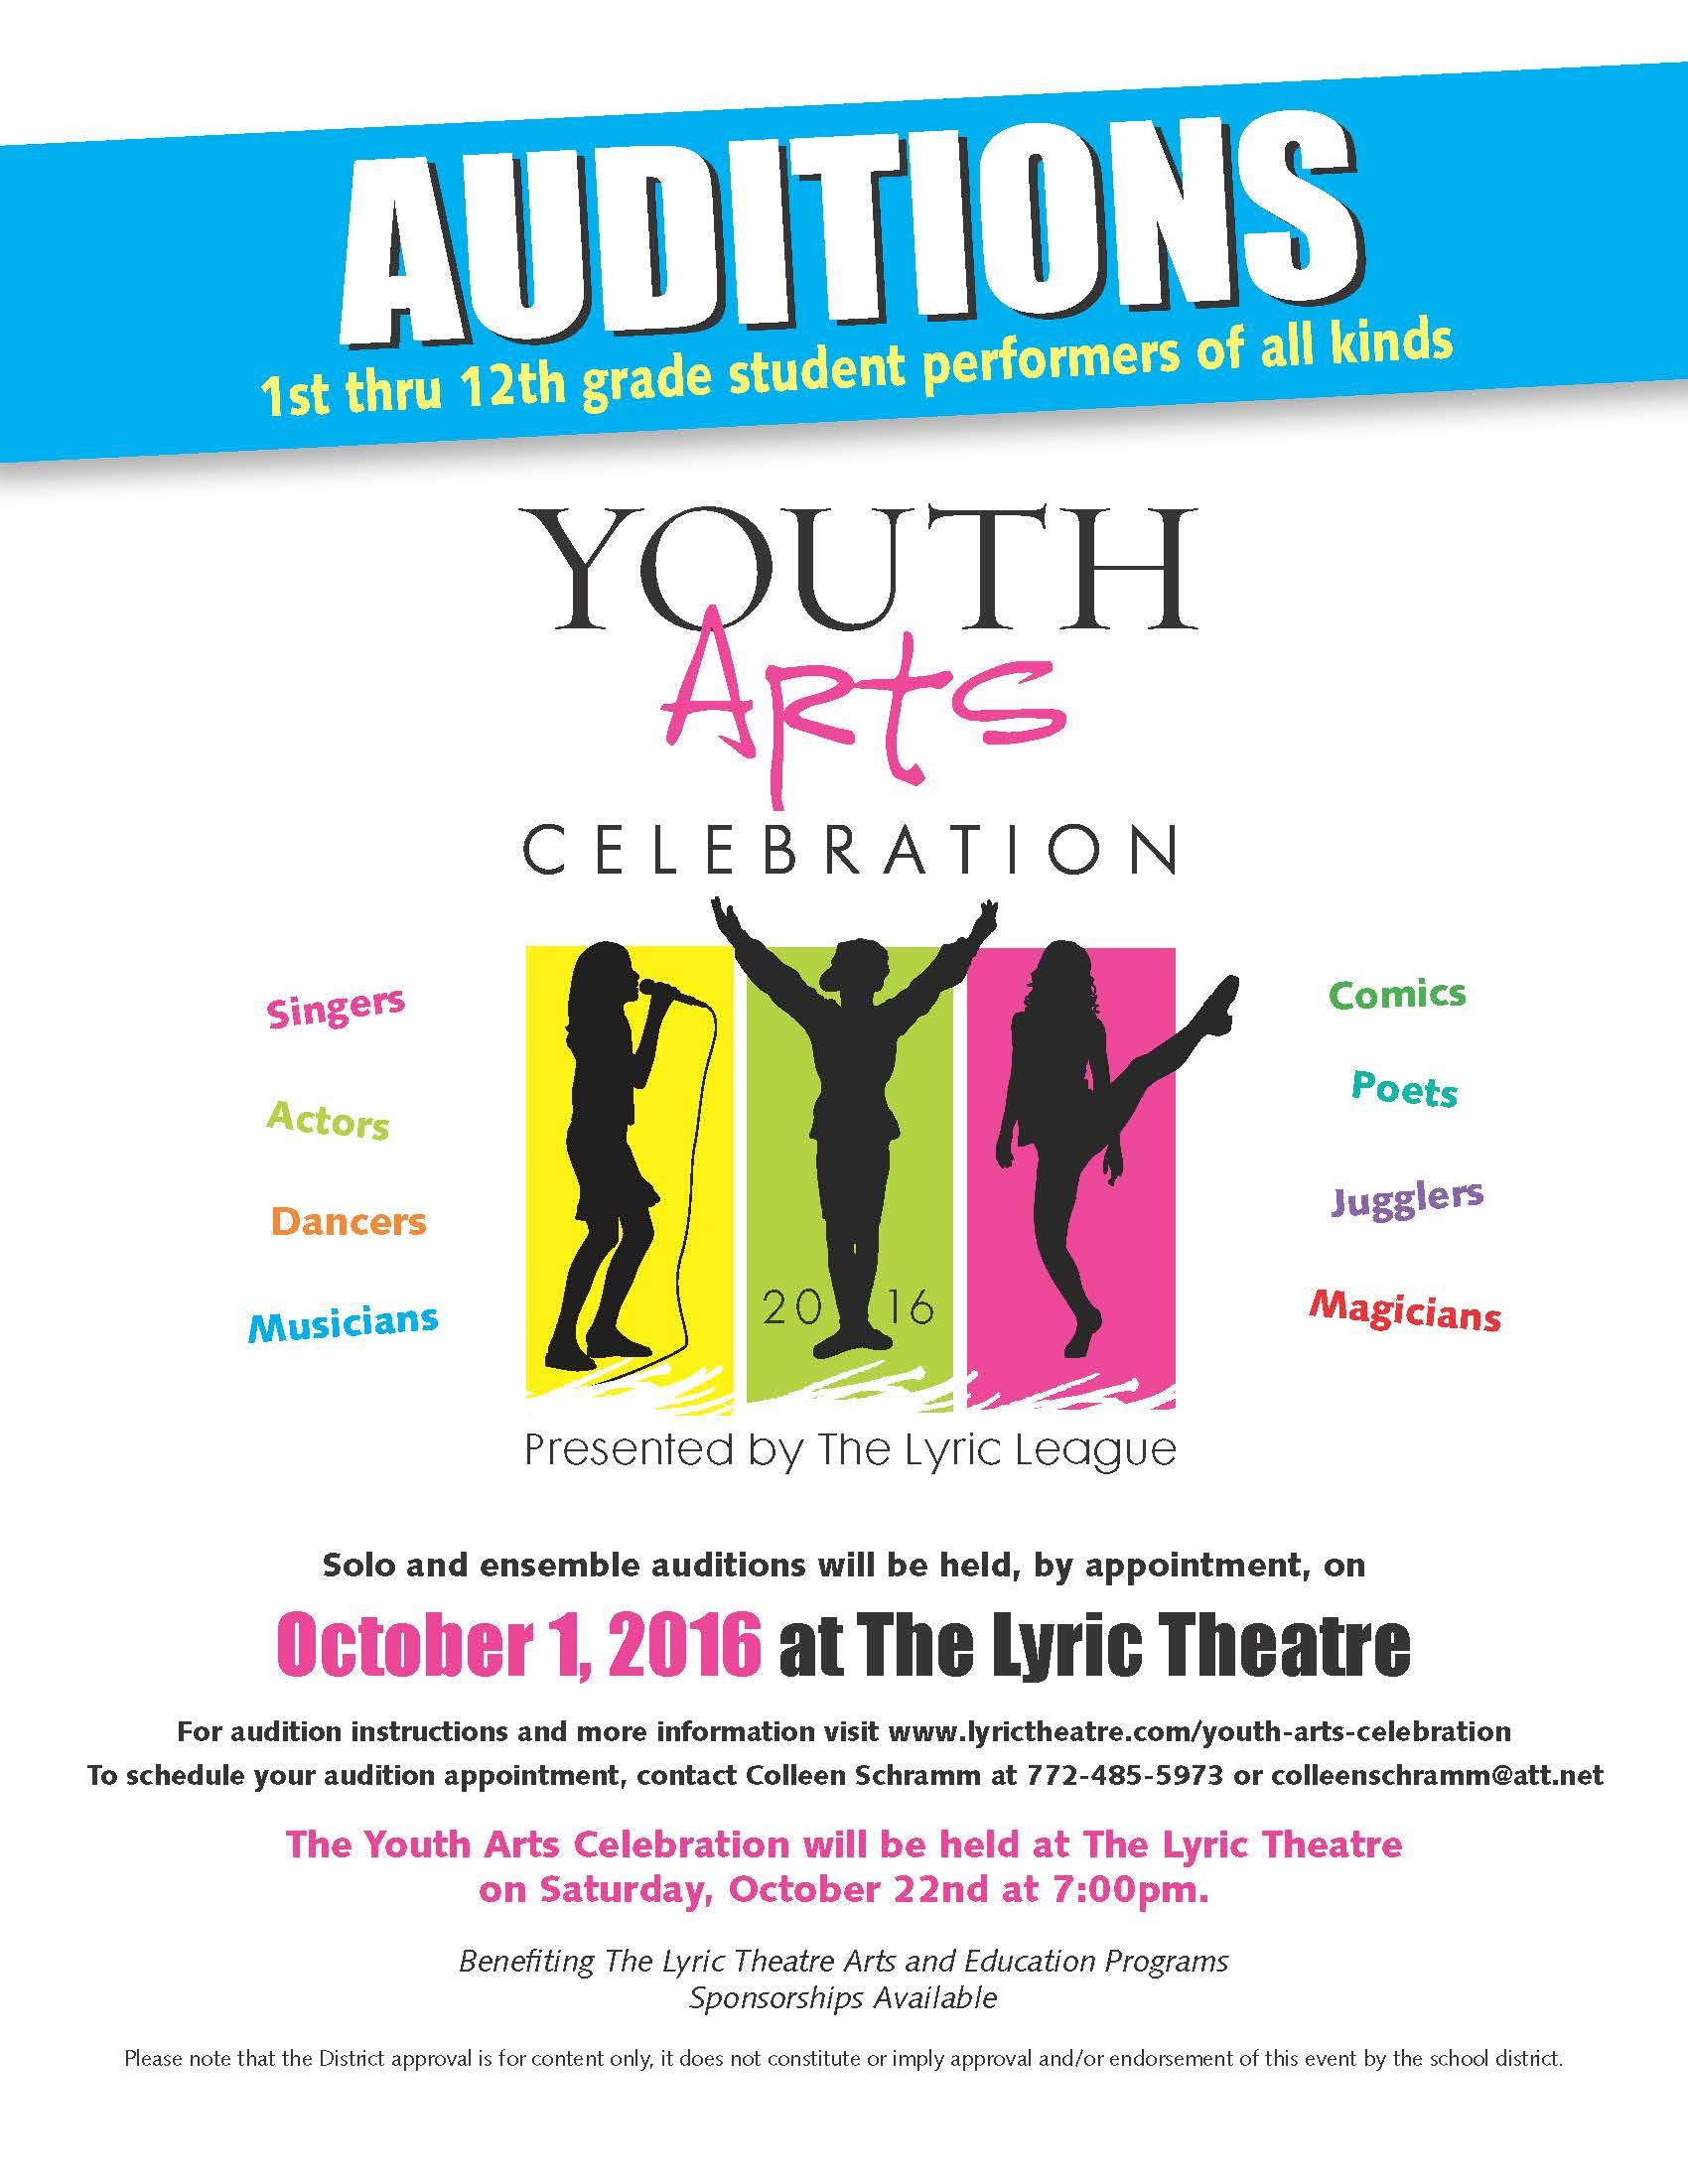 Auditions: Youth Arts Celebration